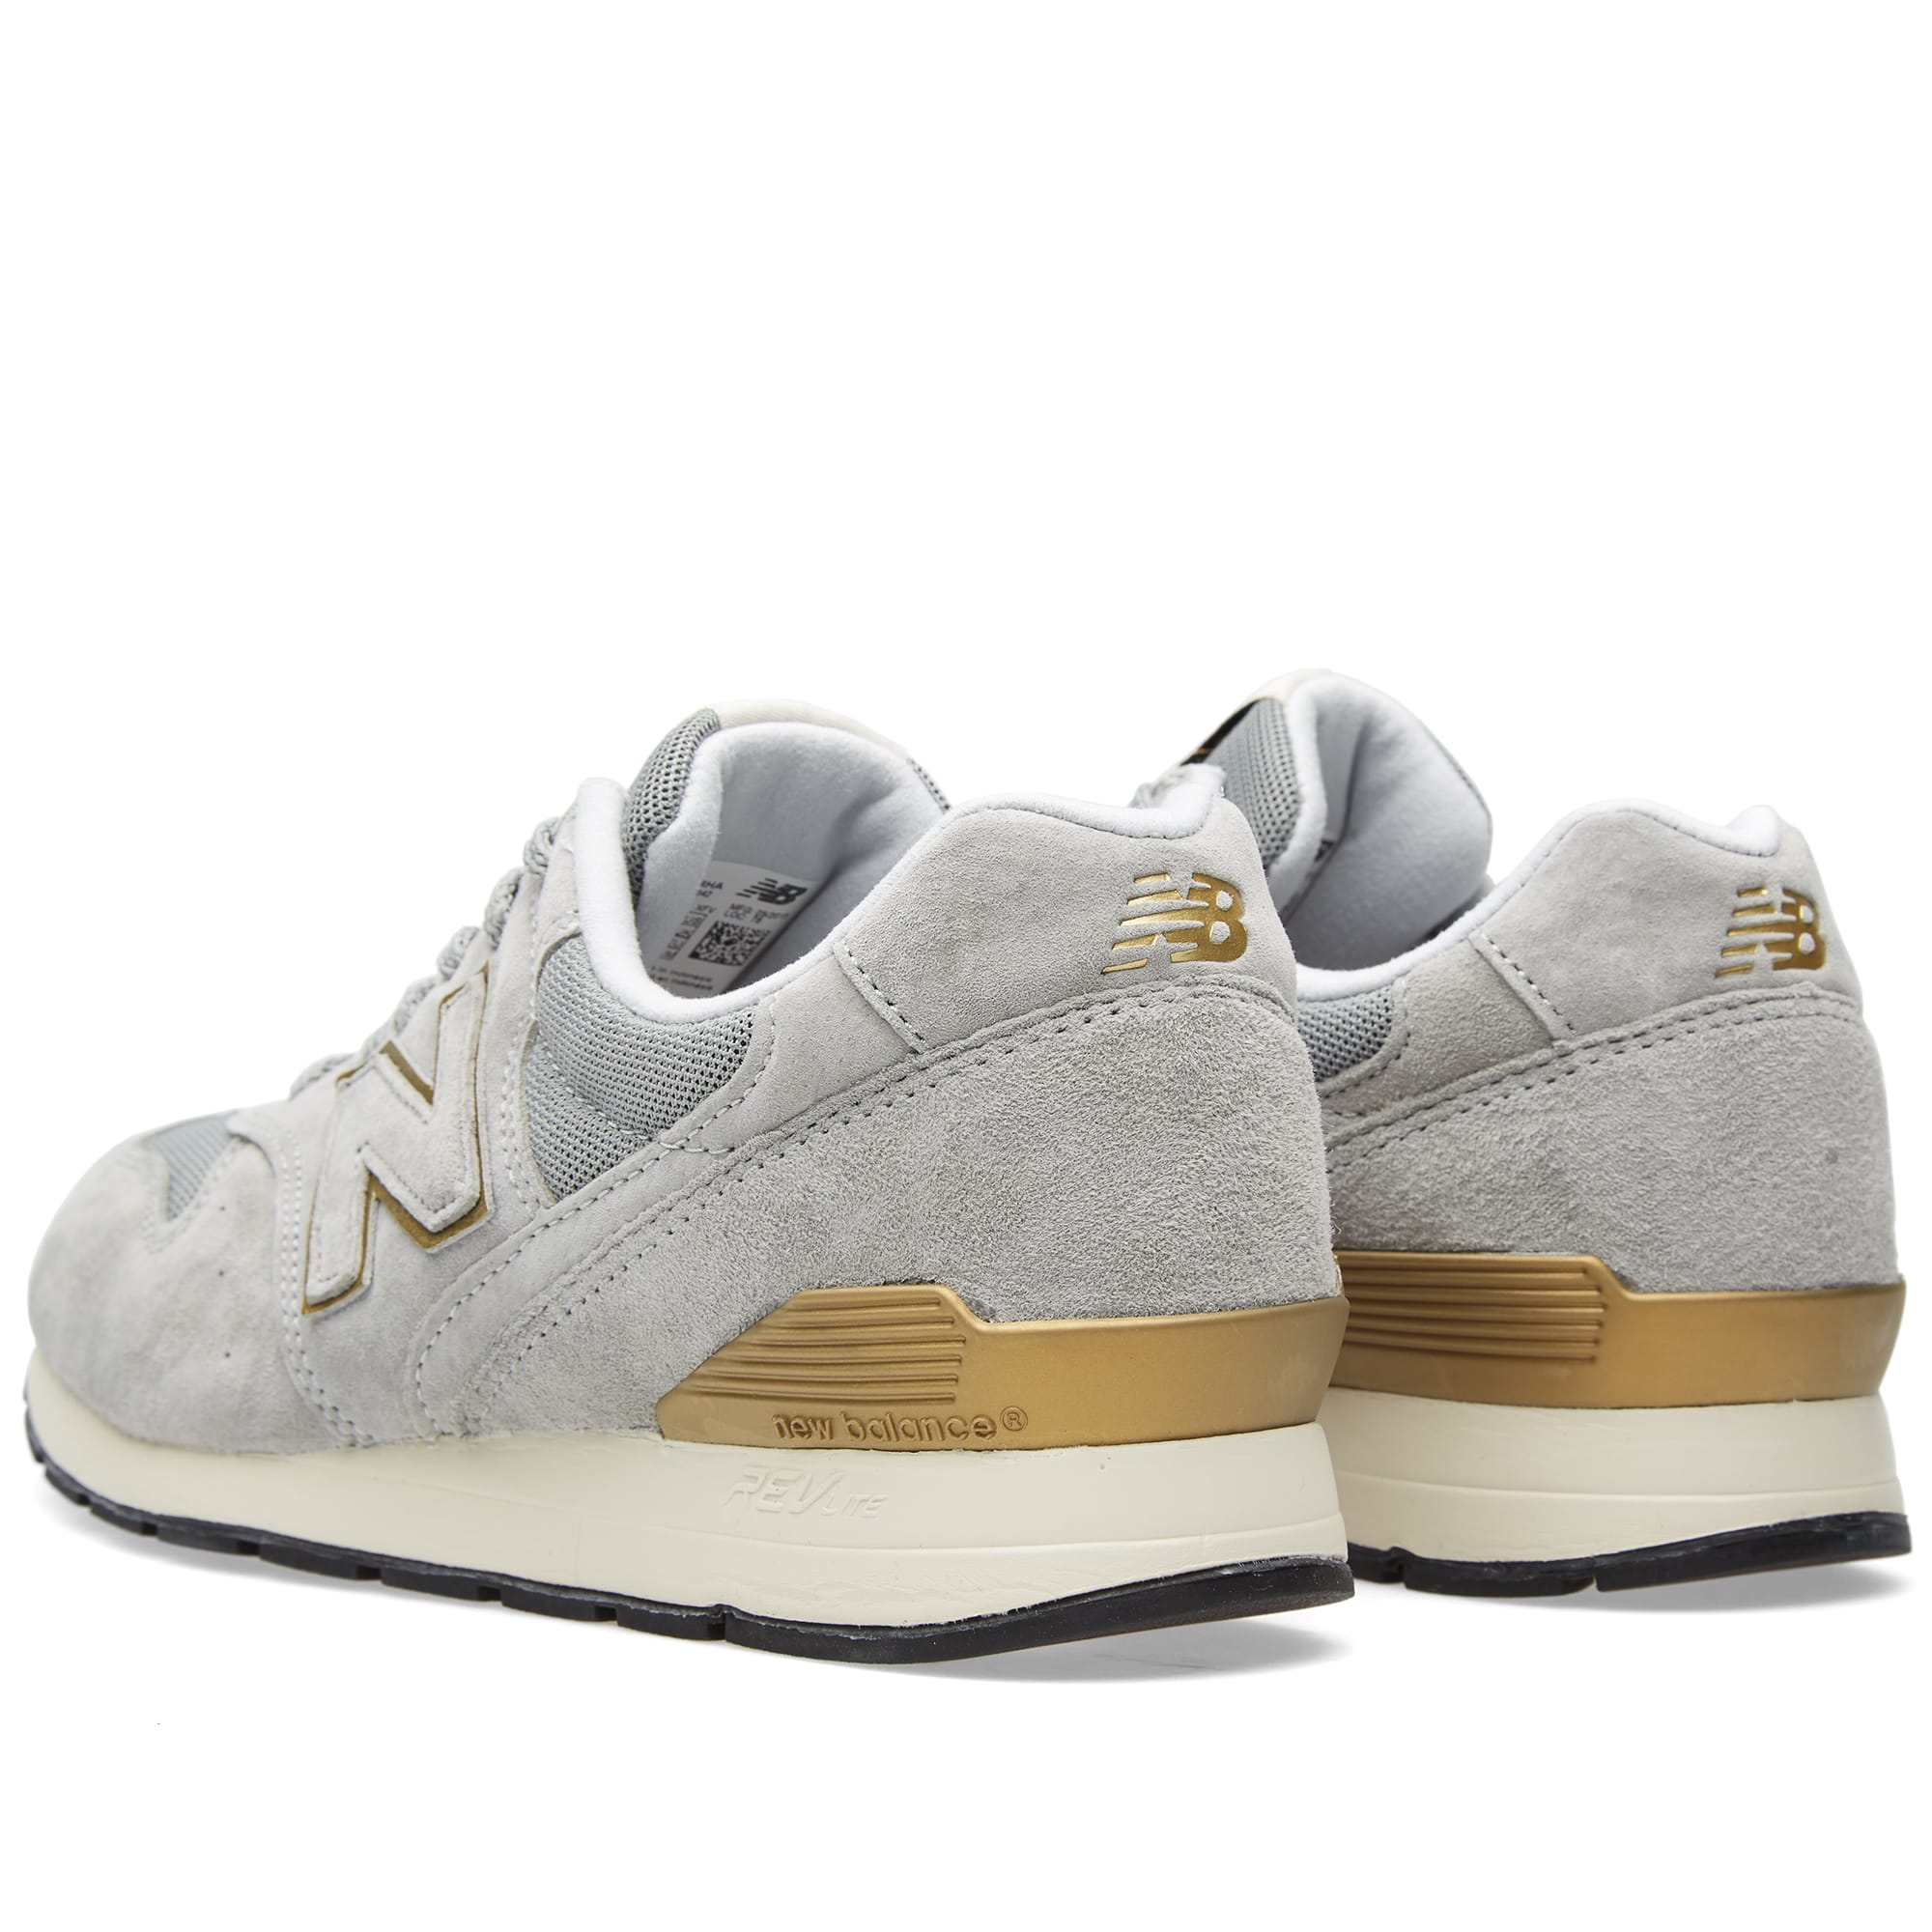 online store 09b8c 499d2 New Balance MRL996HA. Grey   Gold